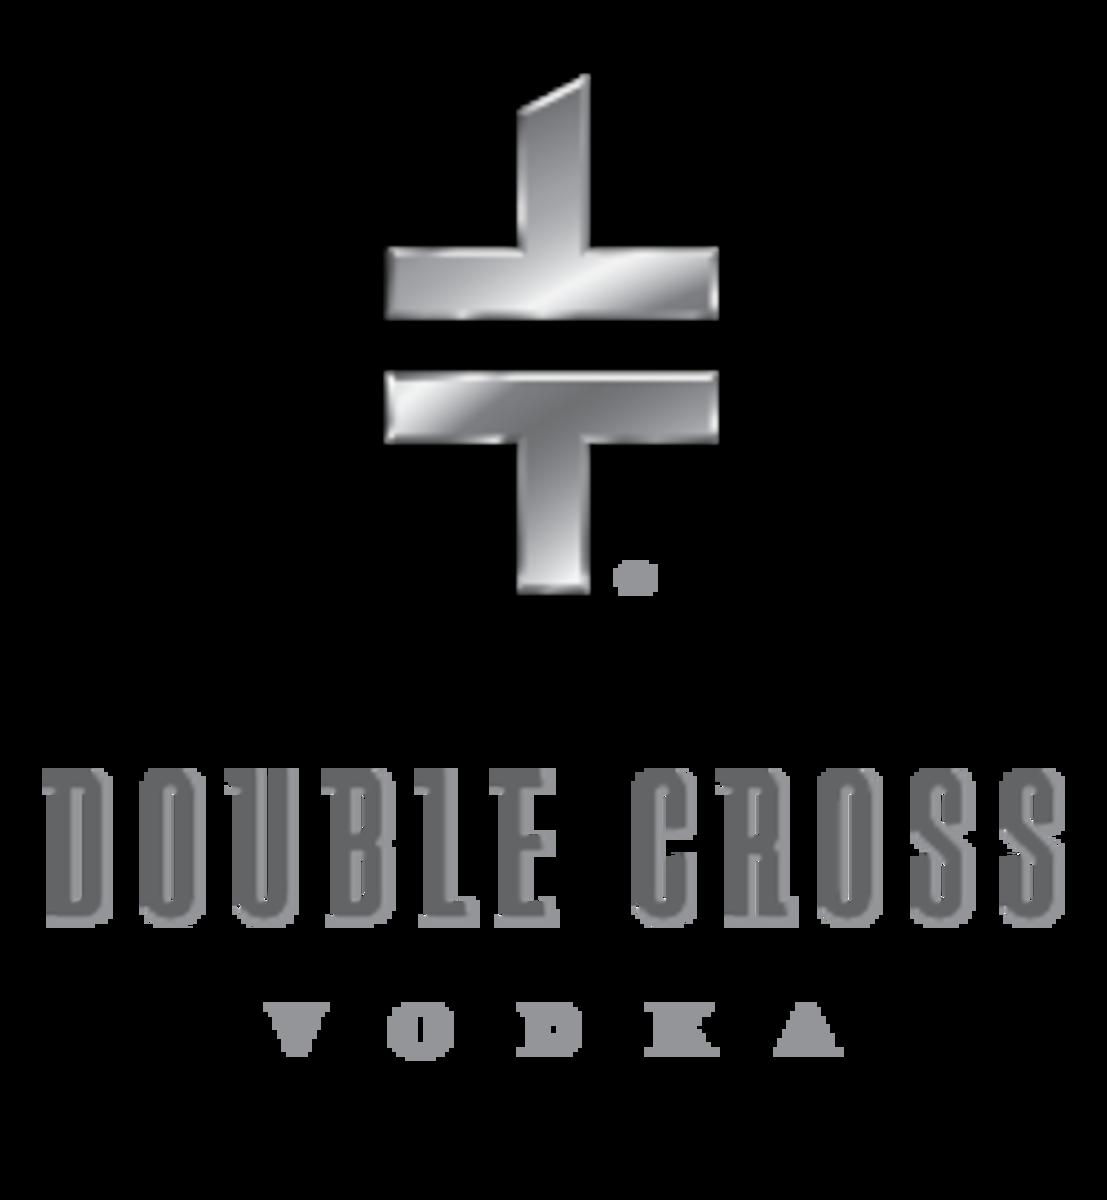 The Double Cross Logo